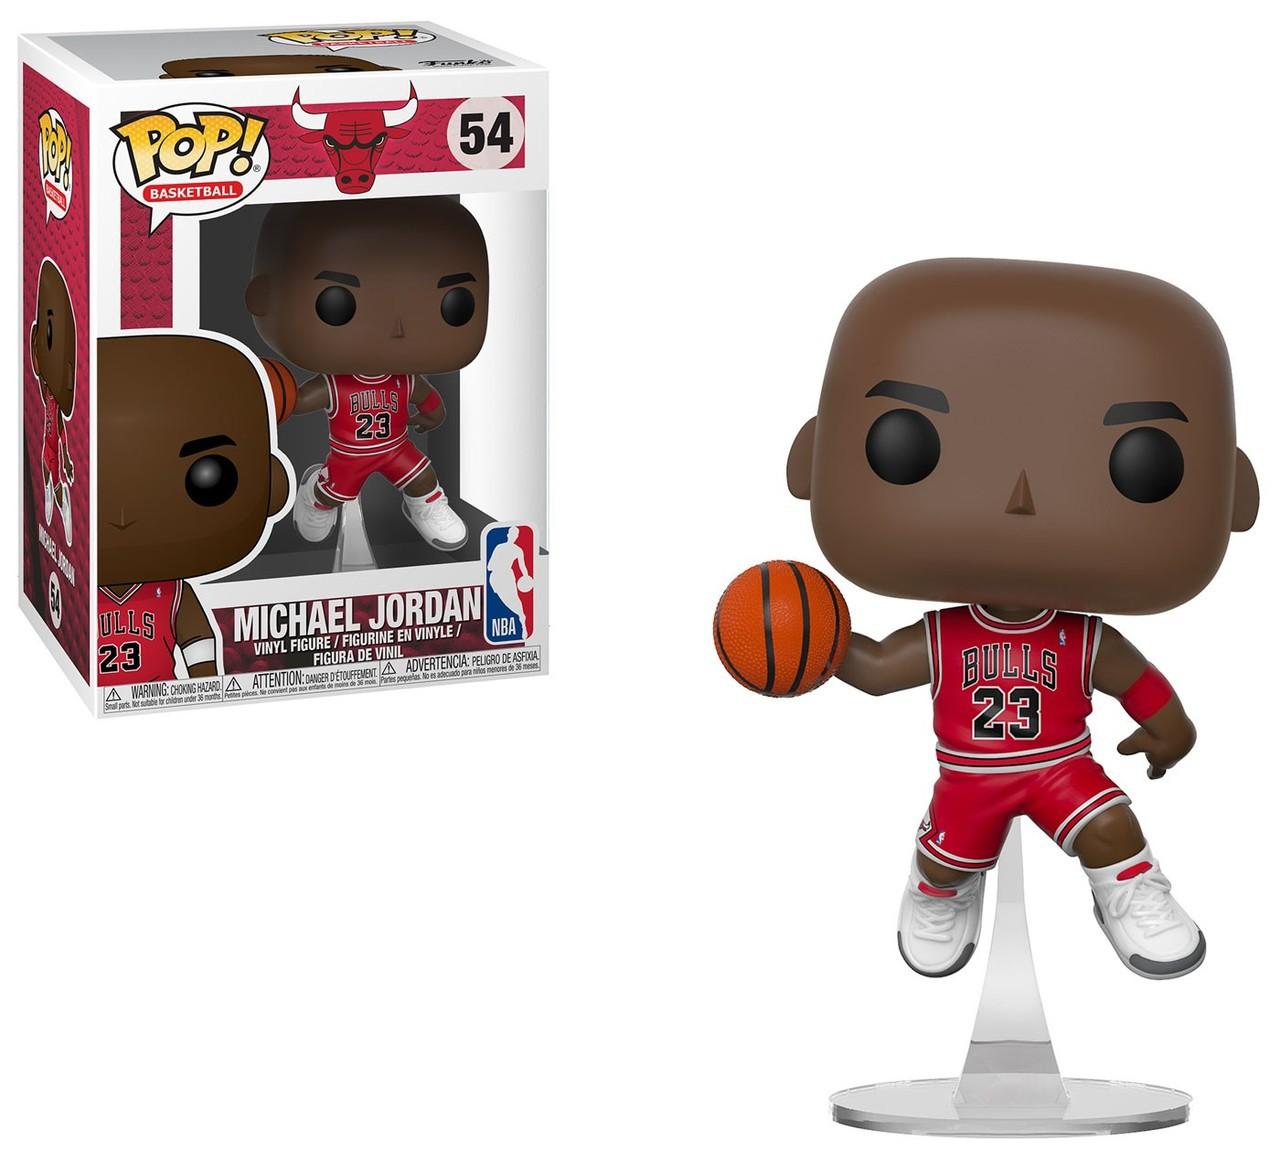 POP FUNKO 54 MICHAEL JORDAN CHICAGO BULLS NBA